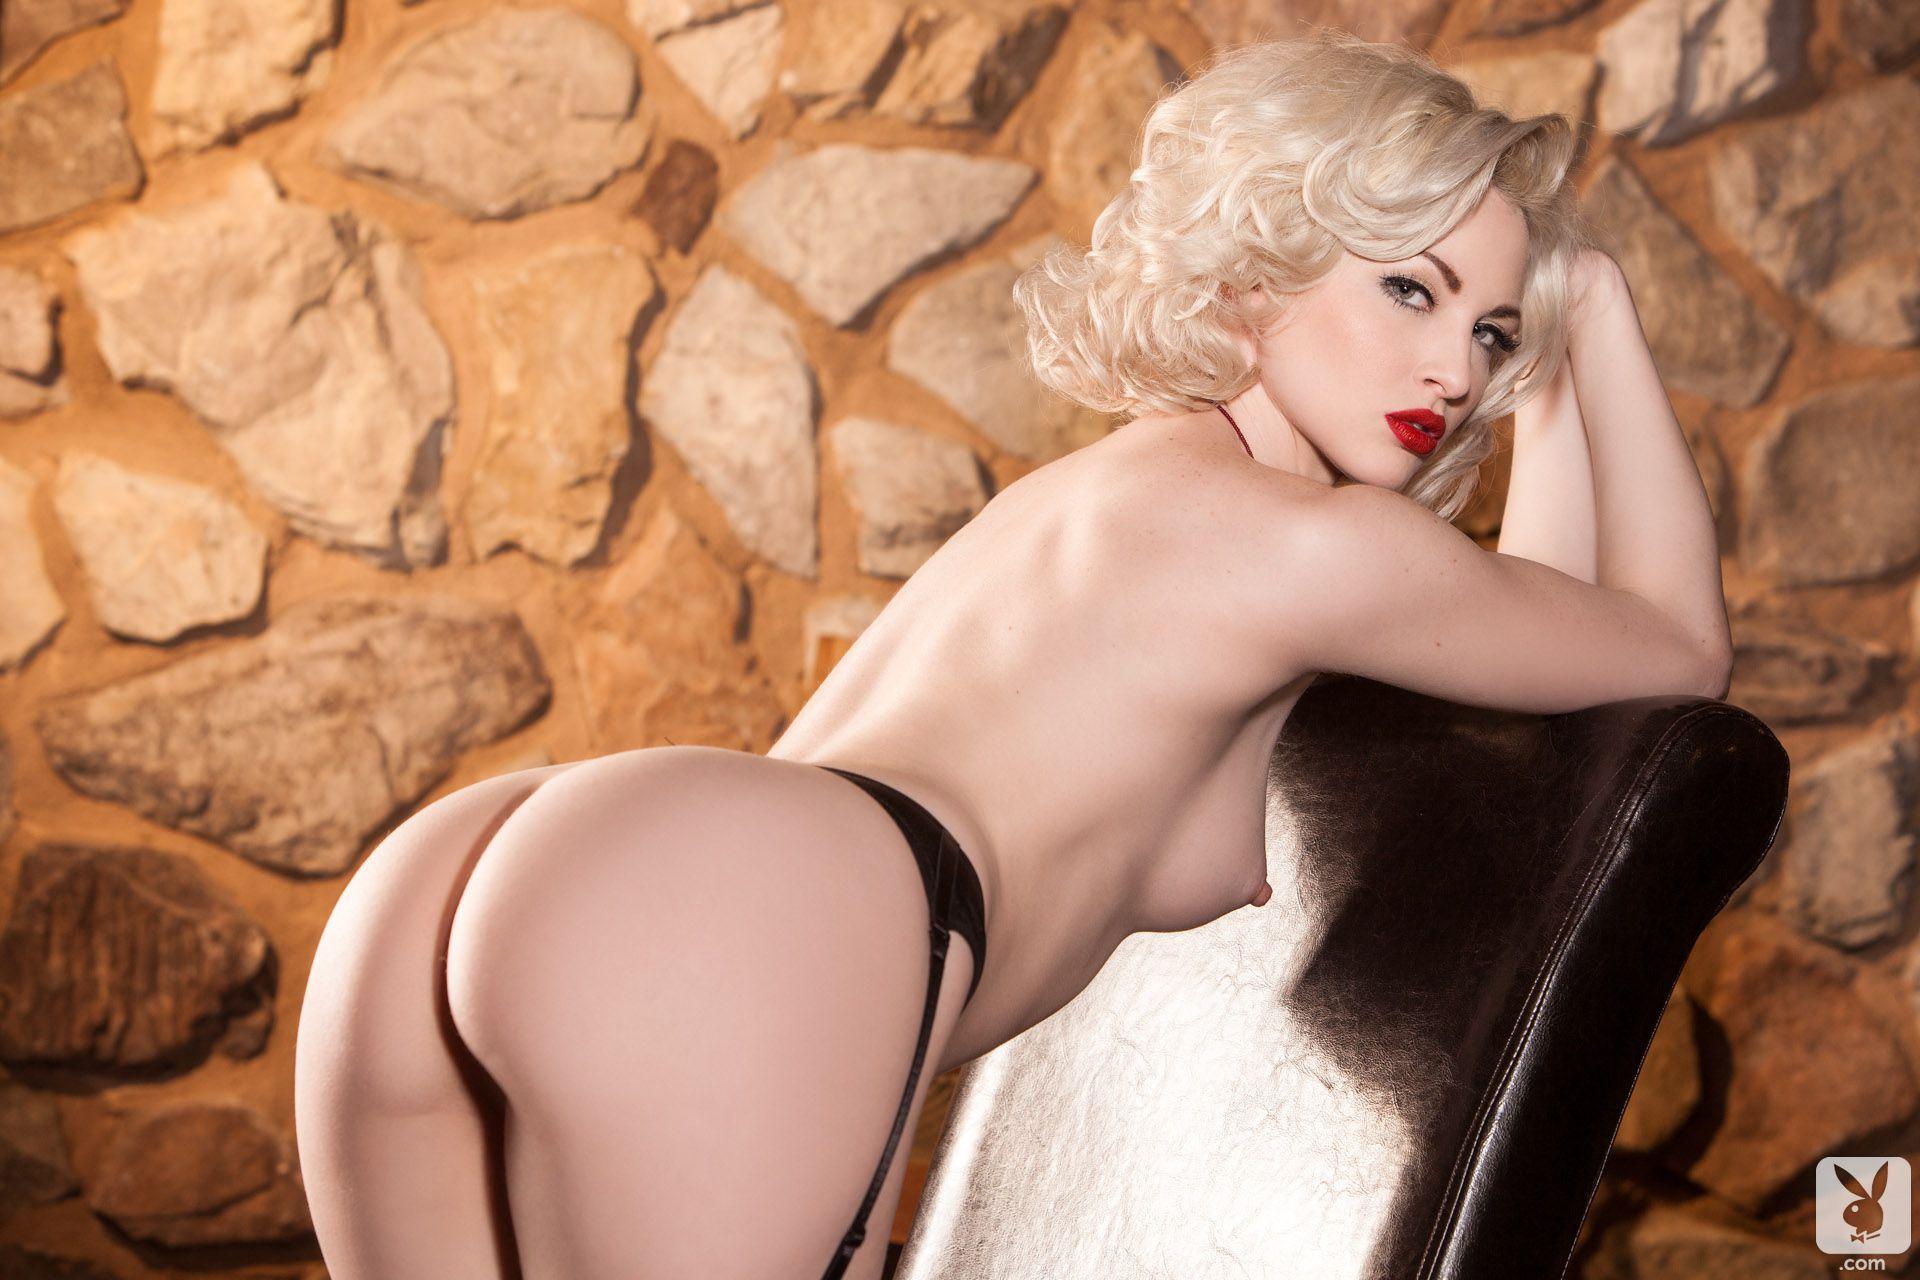 http://i5.imageban.ru/out/2013/11/10/896254f92442f06cf7a3119cc43a0c0e.jpg